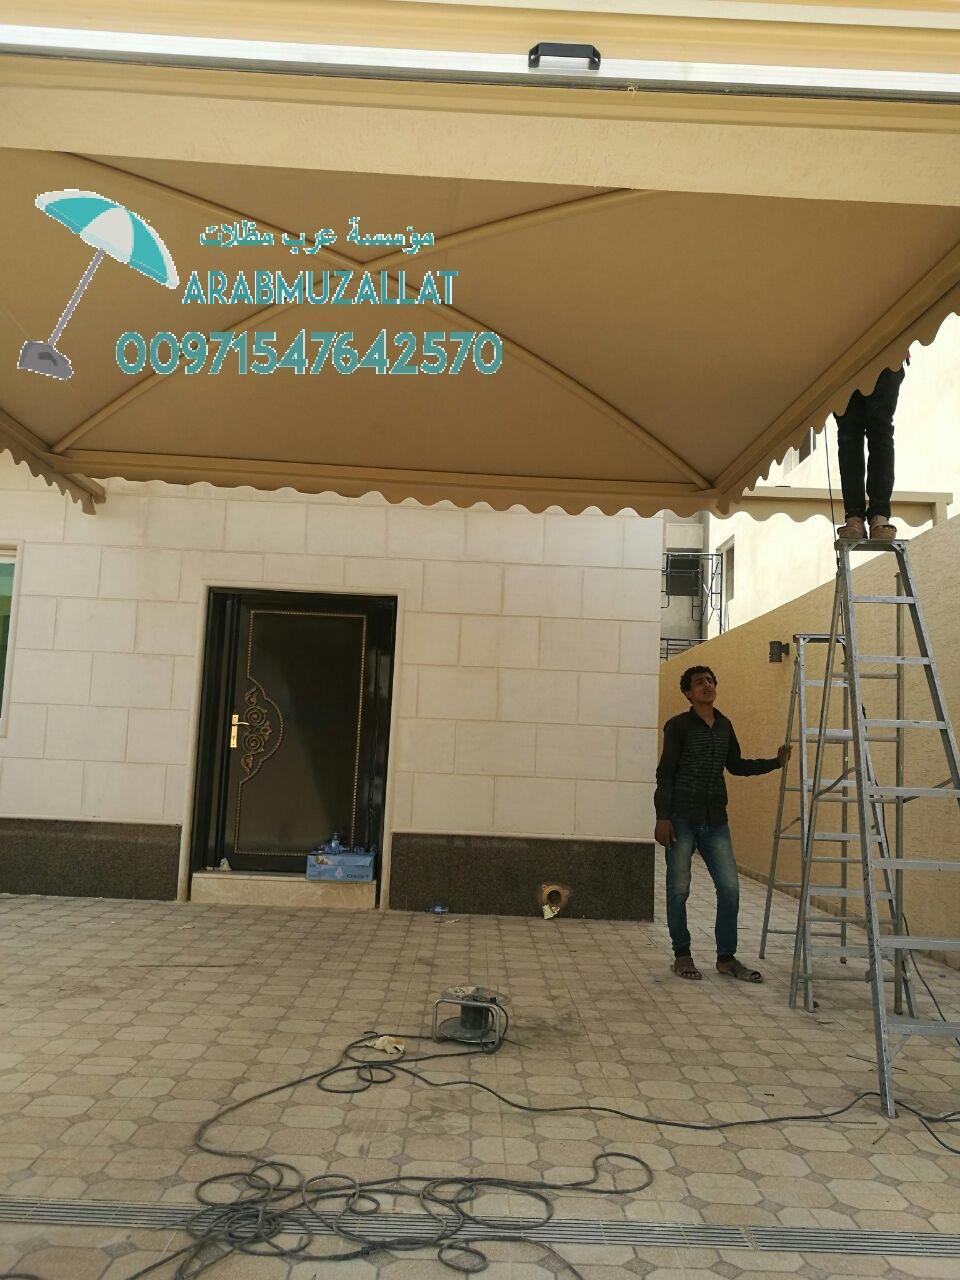 لدينا متخصص تركيب مظلات سواتر 00971547642570